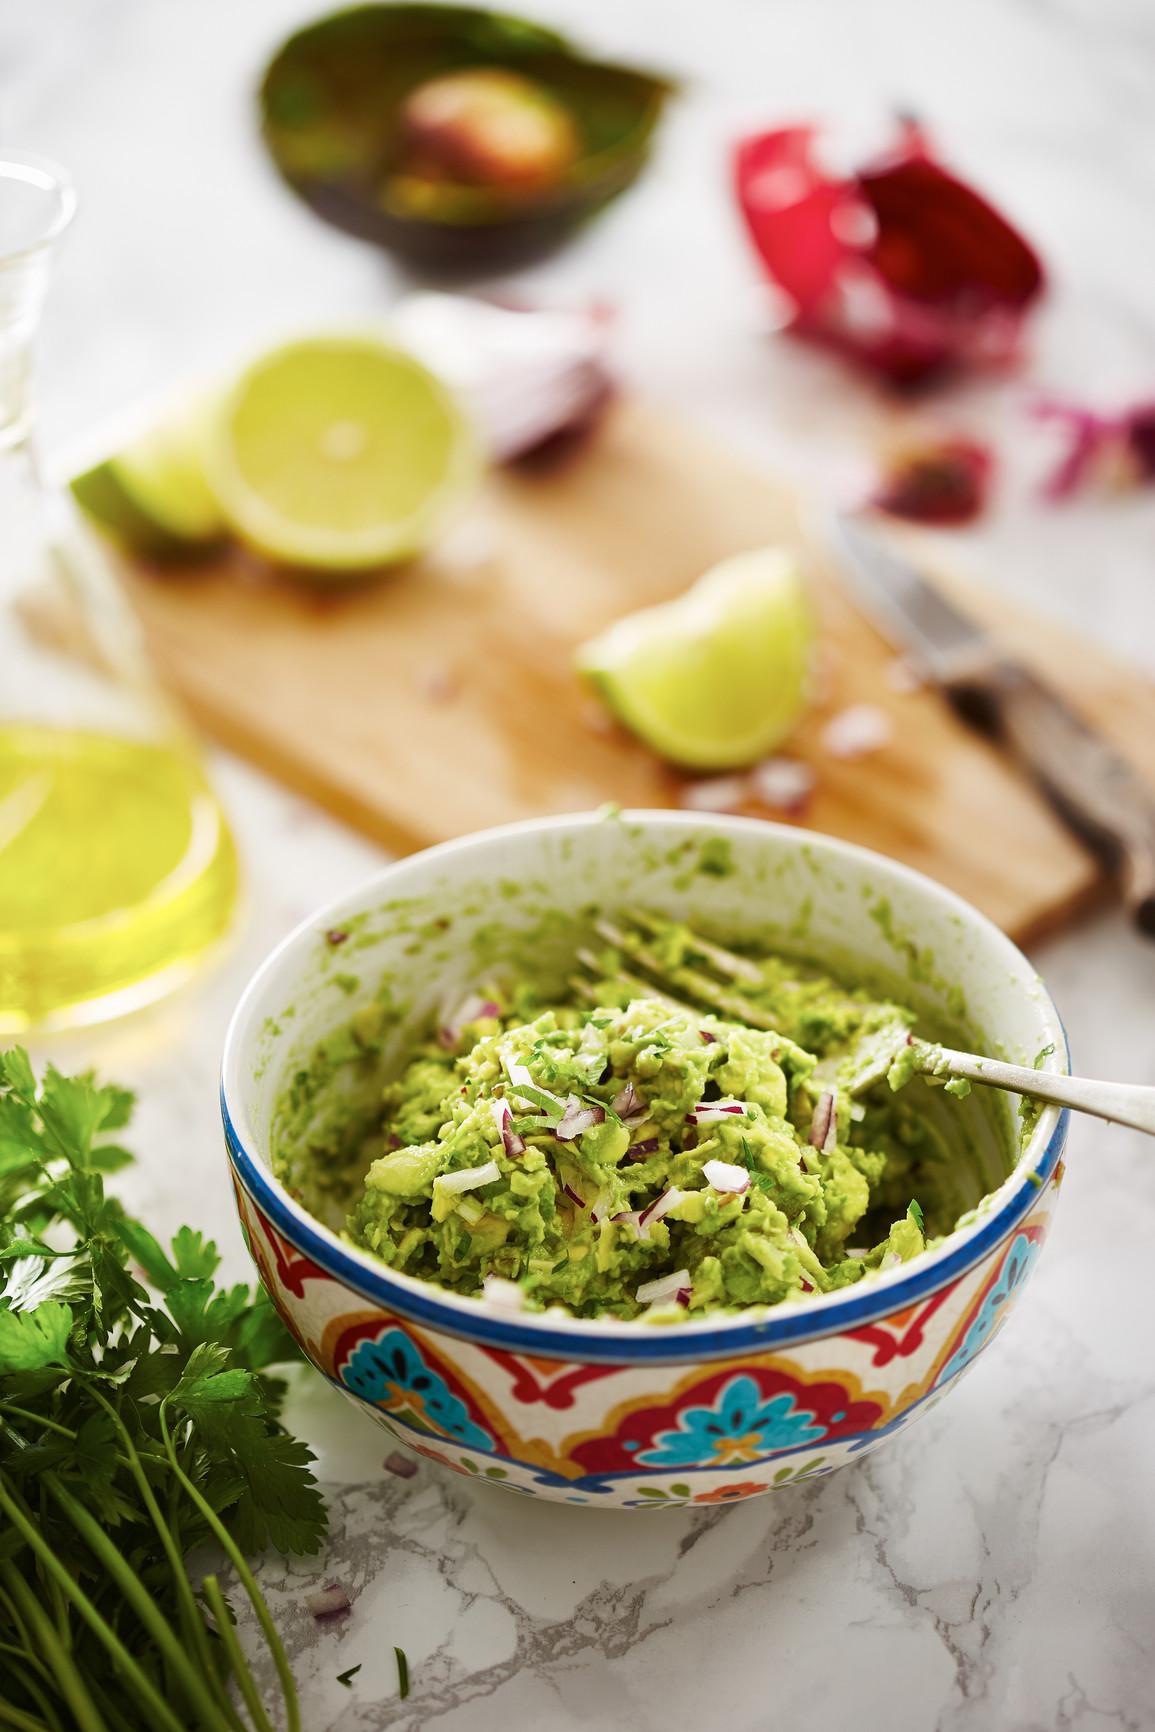 Healthy Guacamole Meals  3 Healthy Mexican Dip Ideas for Your Next Fiesta Party